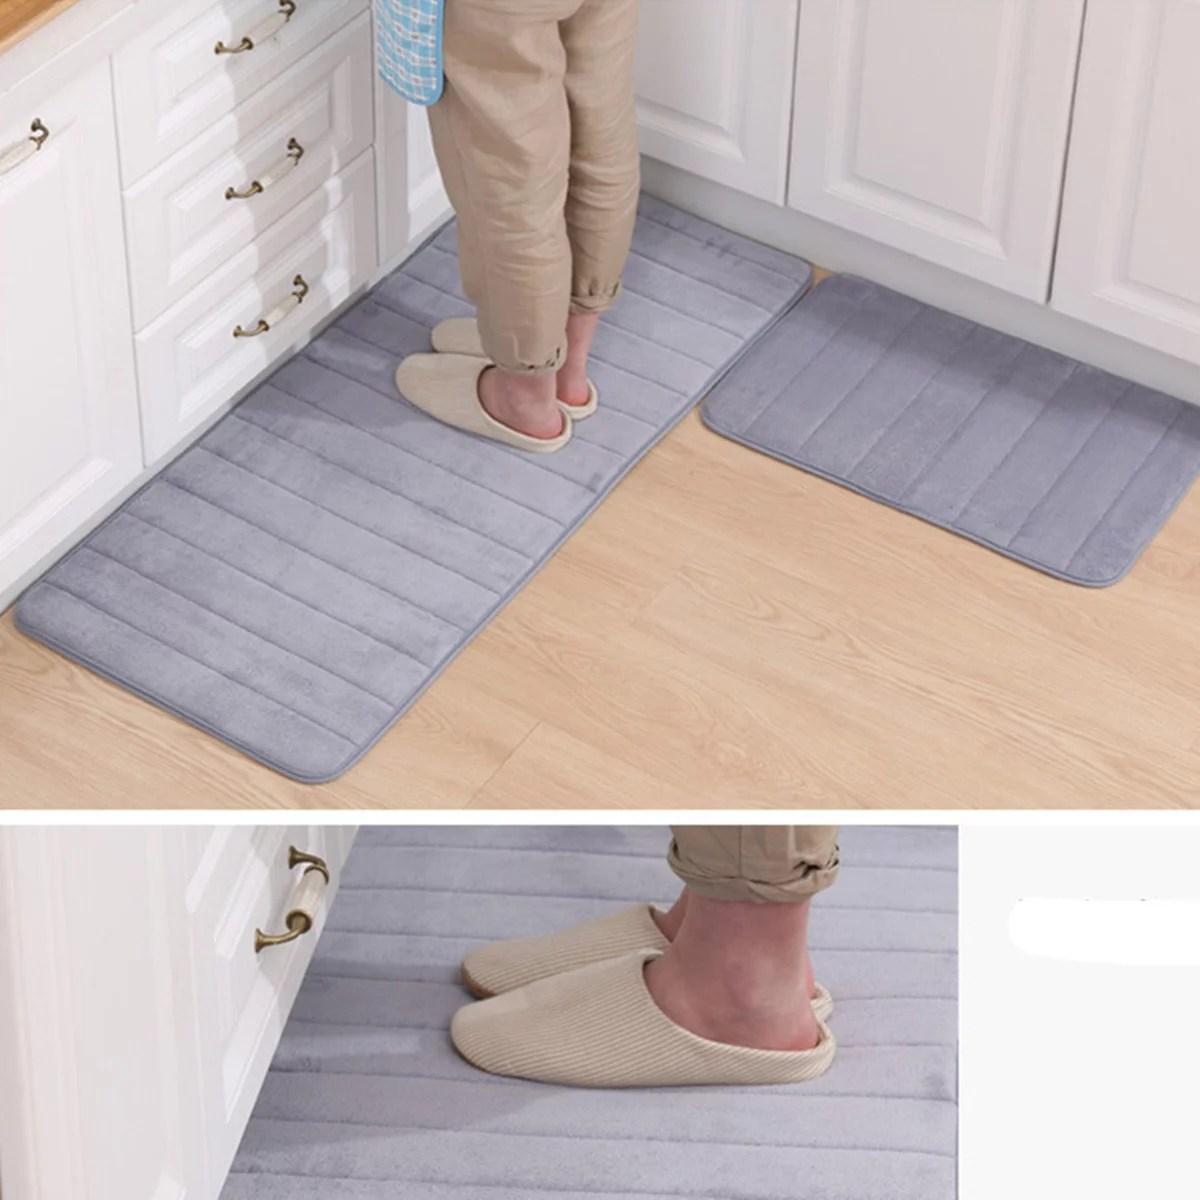 20 x30 62 x20 memory foam mat absorbent slip resistant on farmhouse colors for bath mats walmart id=19651